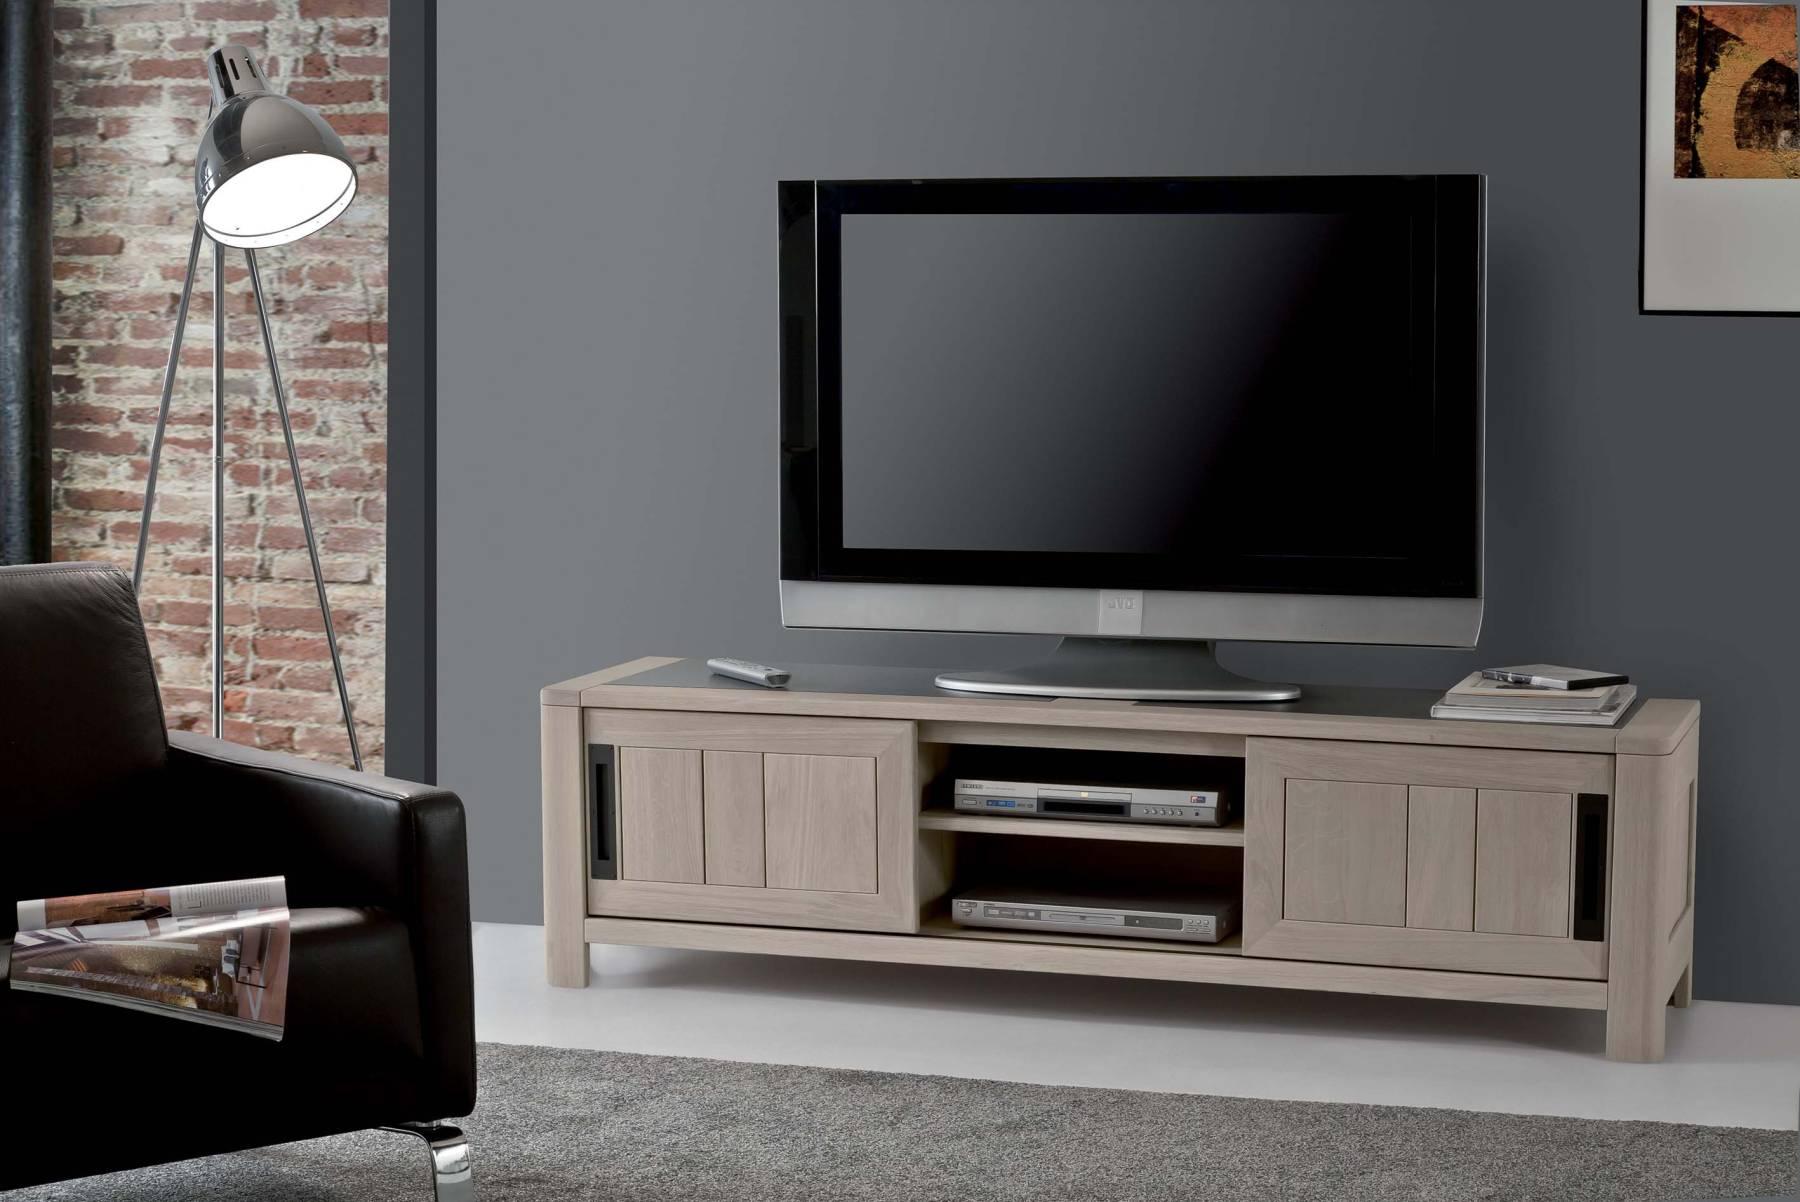 meuble t v deauvil bois deco. Black Bedroom Furniture Sets. Home Design Ideas